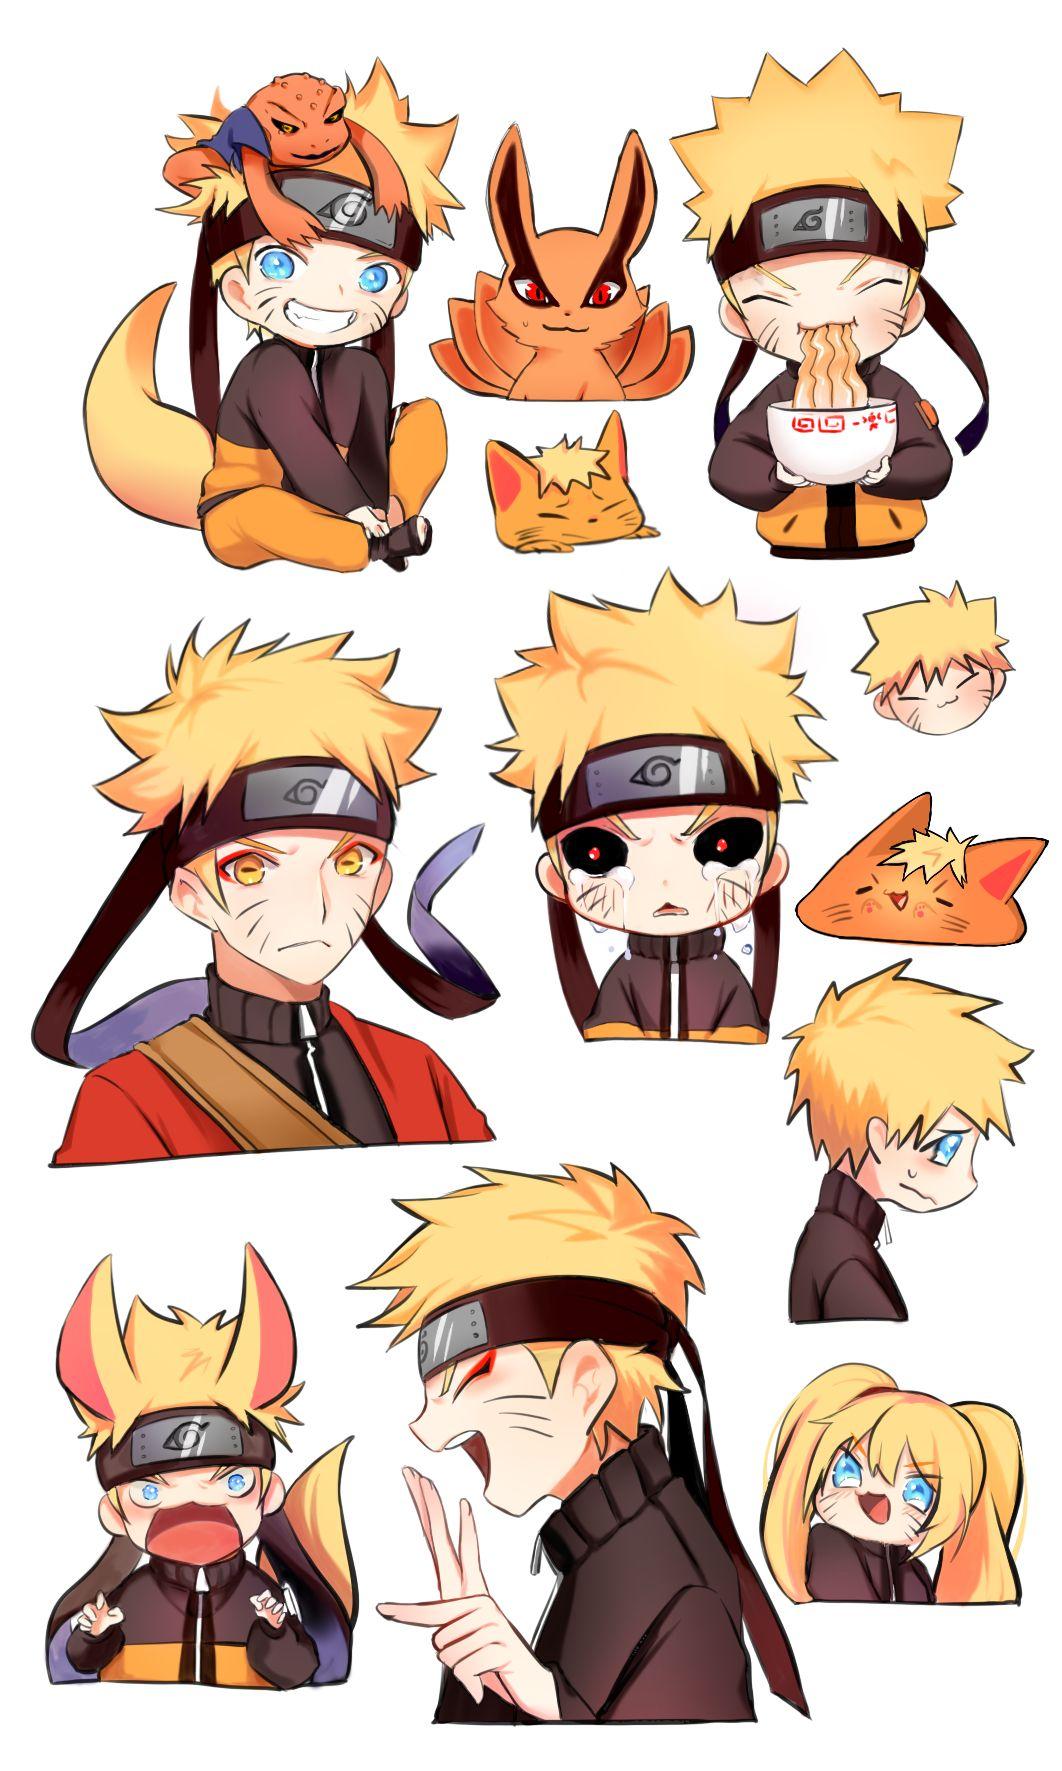 Narutoランの漫画 Pixiv イラスト 漫画 イラスト